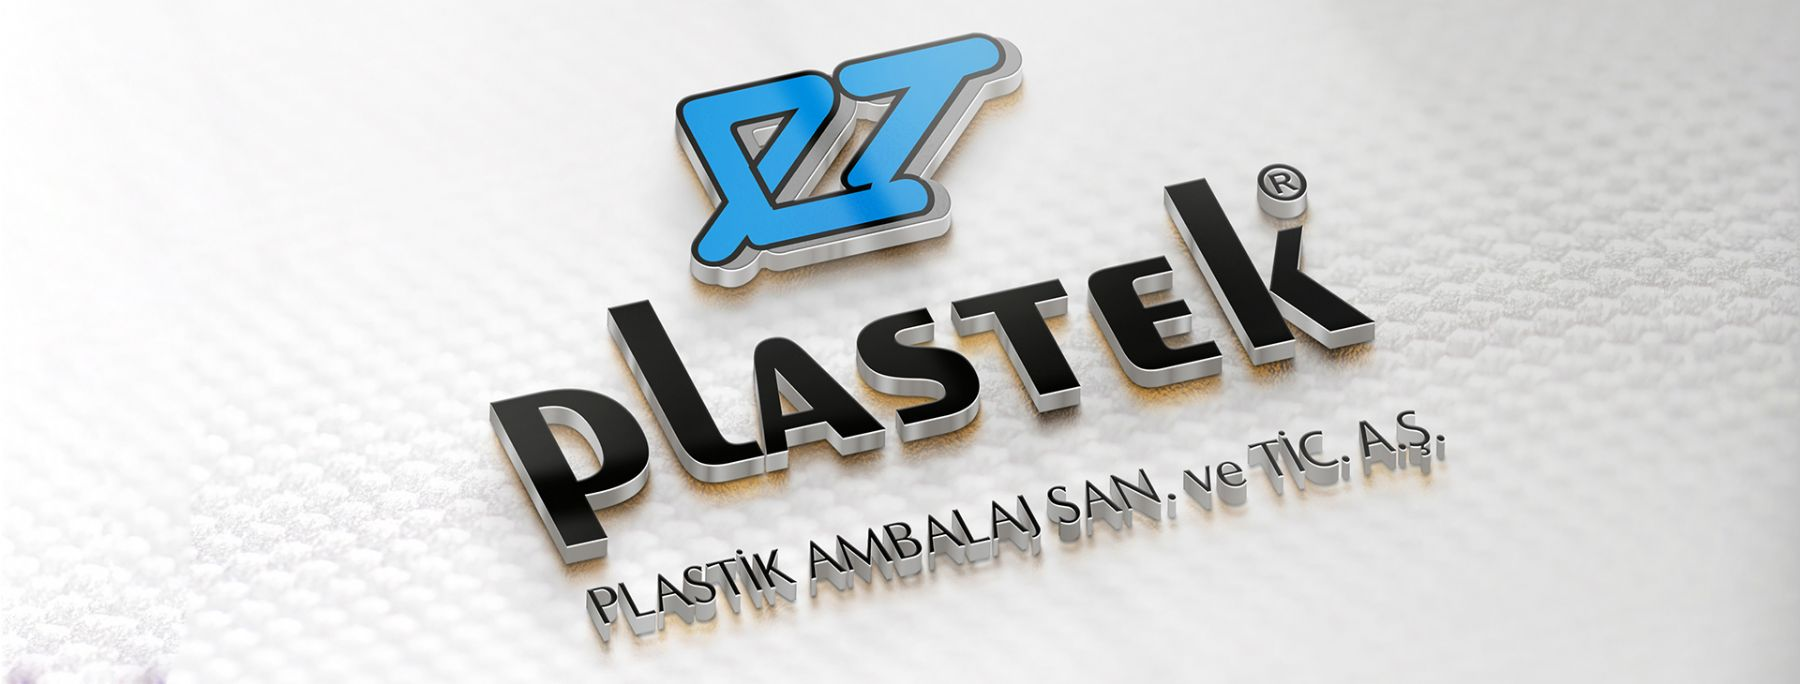 Plastek Plastik Ambalaj